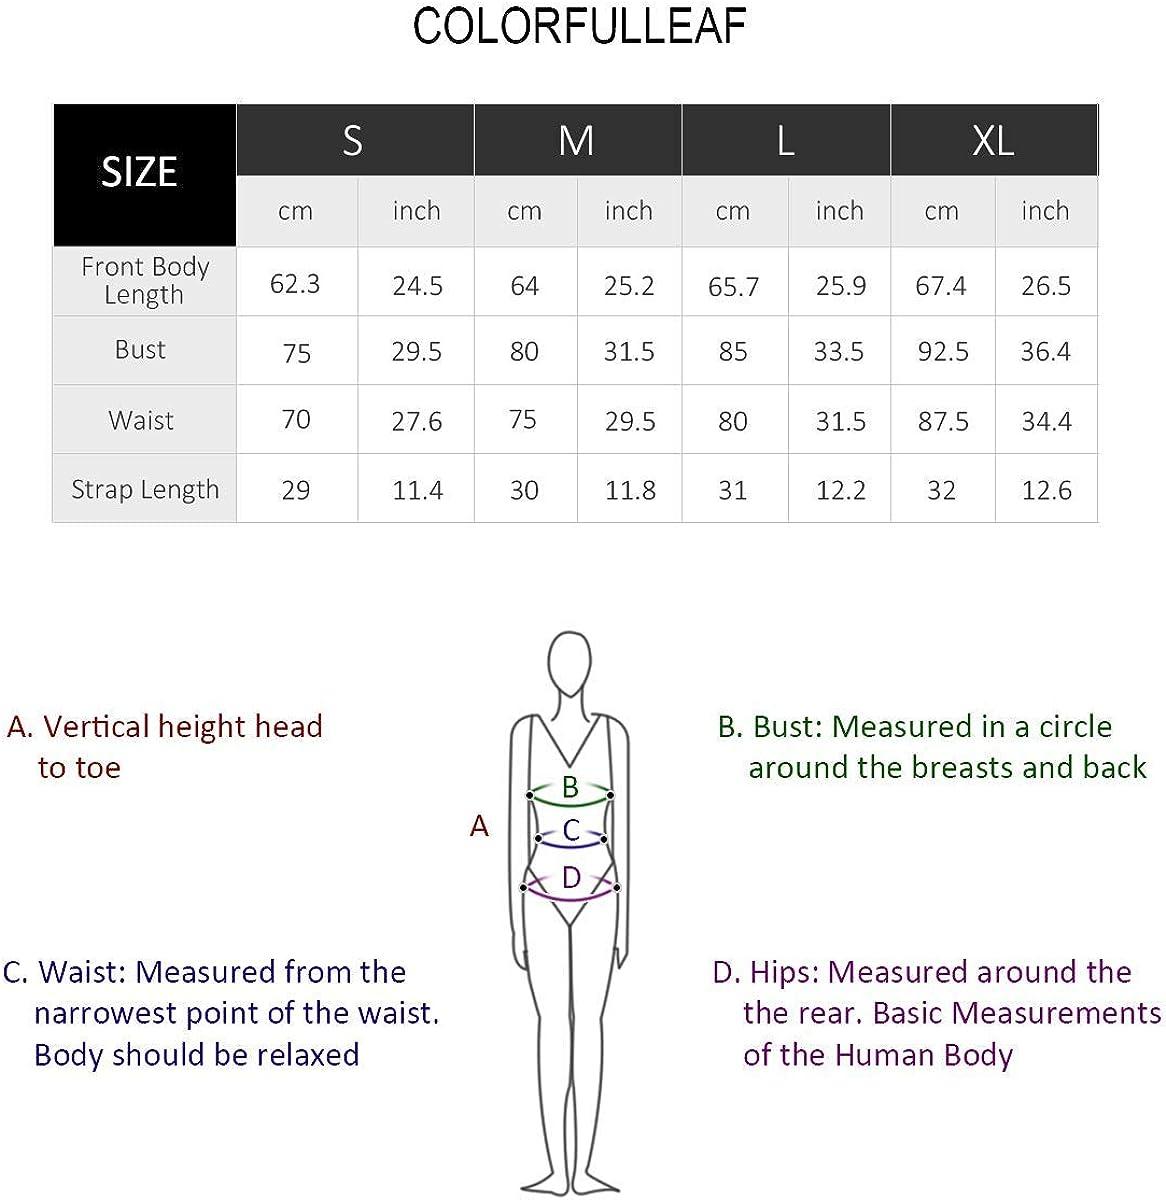 COLORFULLEAF Women's Lingerie V Neck Babydoll Lace Chemise Sexy Full Slips Sleepwear Teddy Negligee